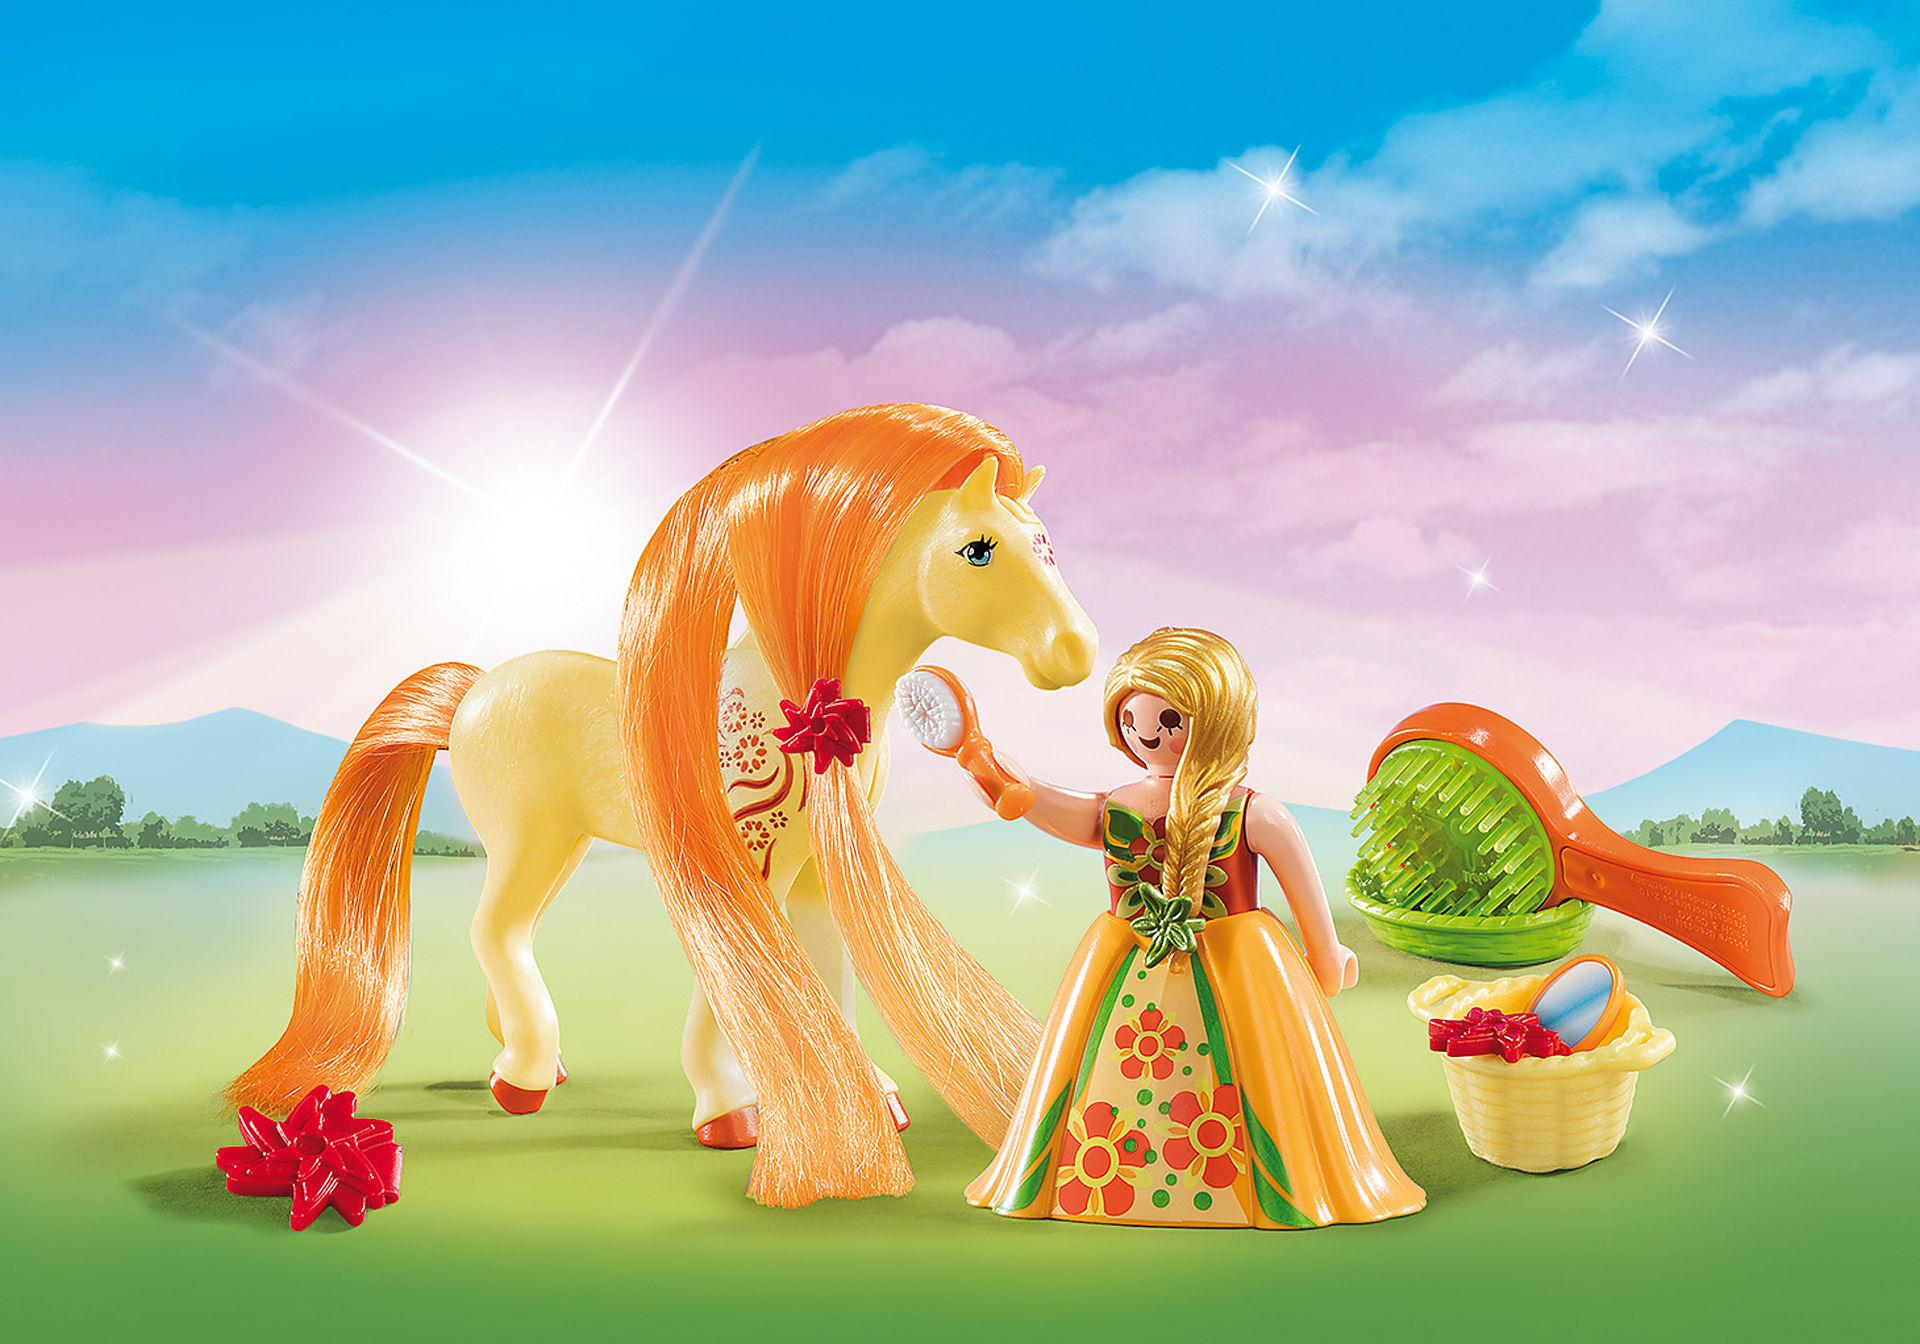 5656 Maleta grande Princesa com Cavalo zoom image1